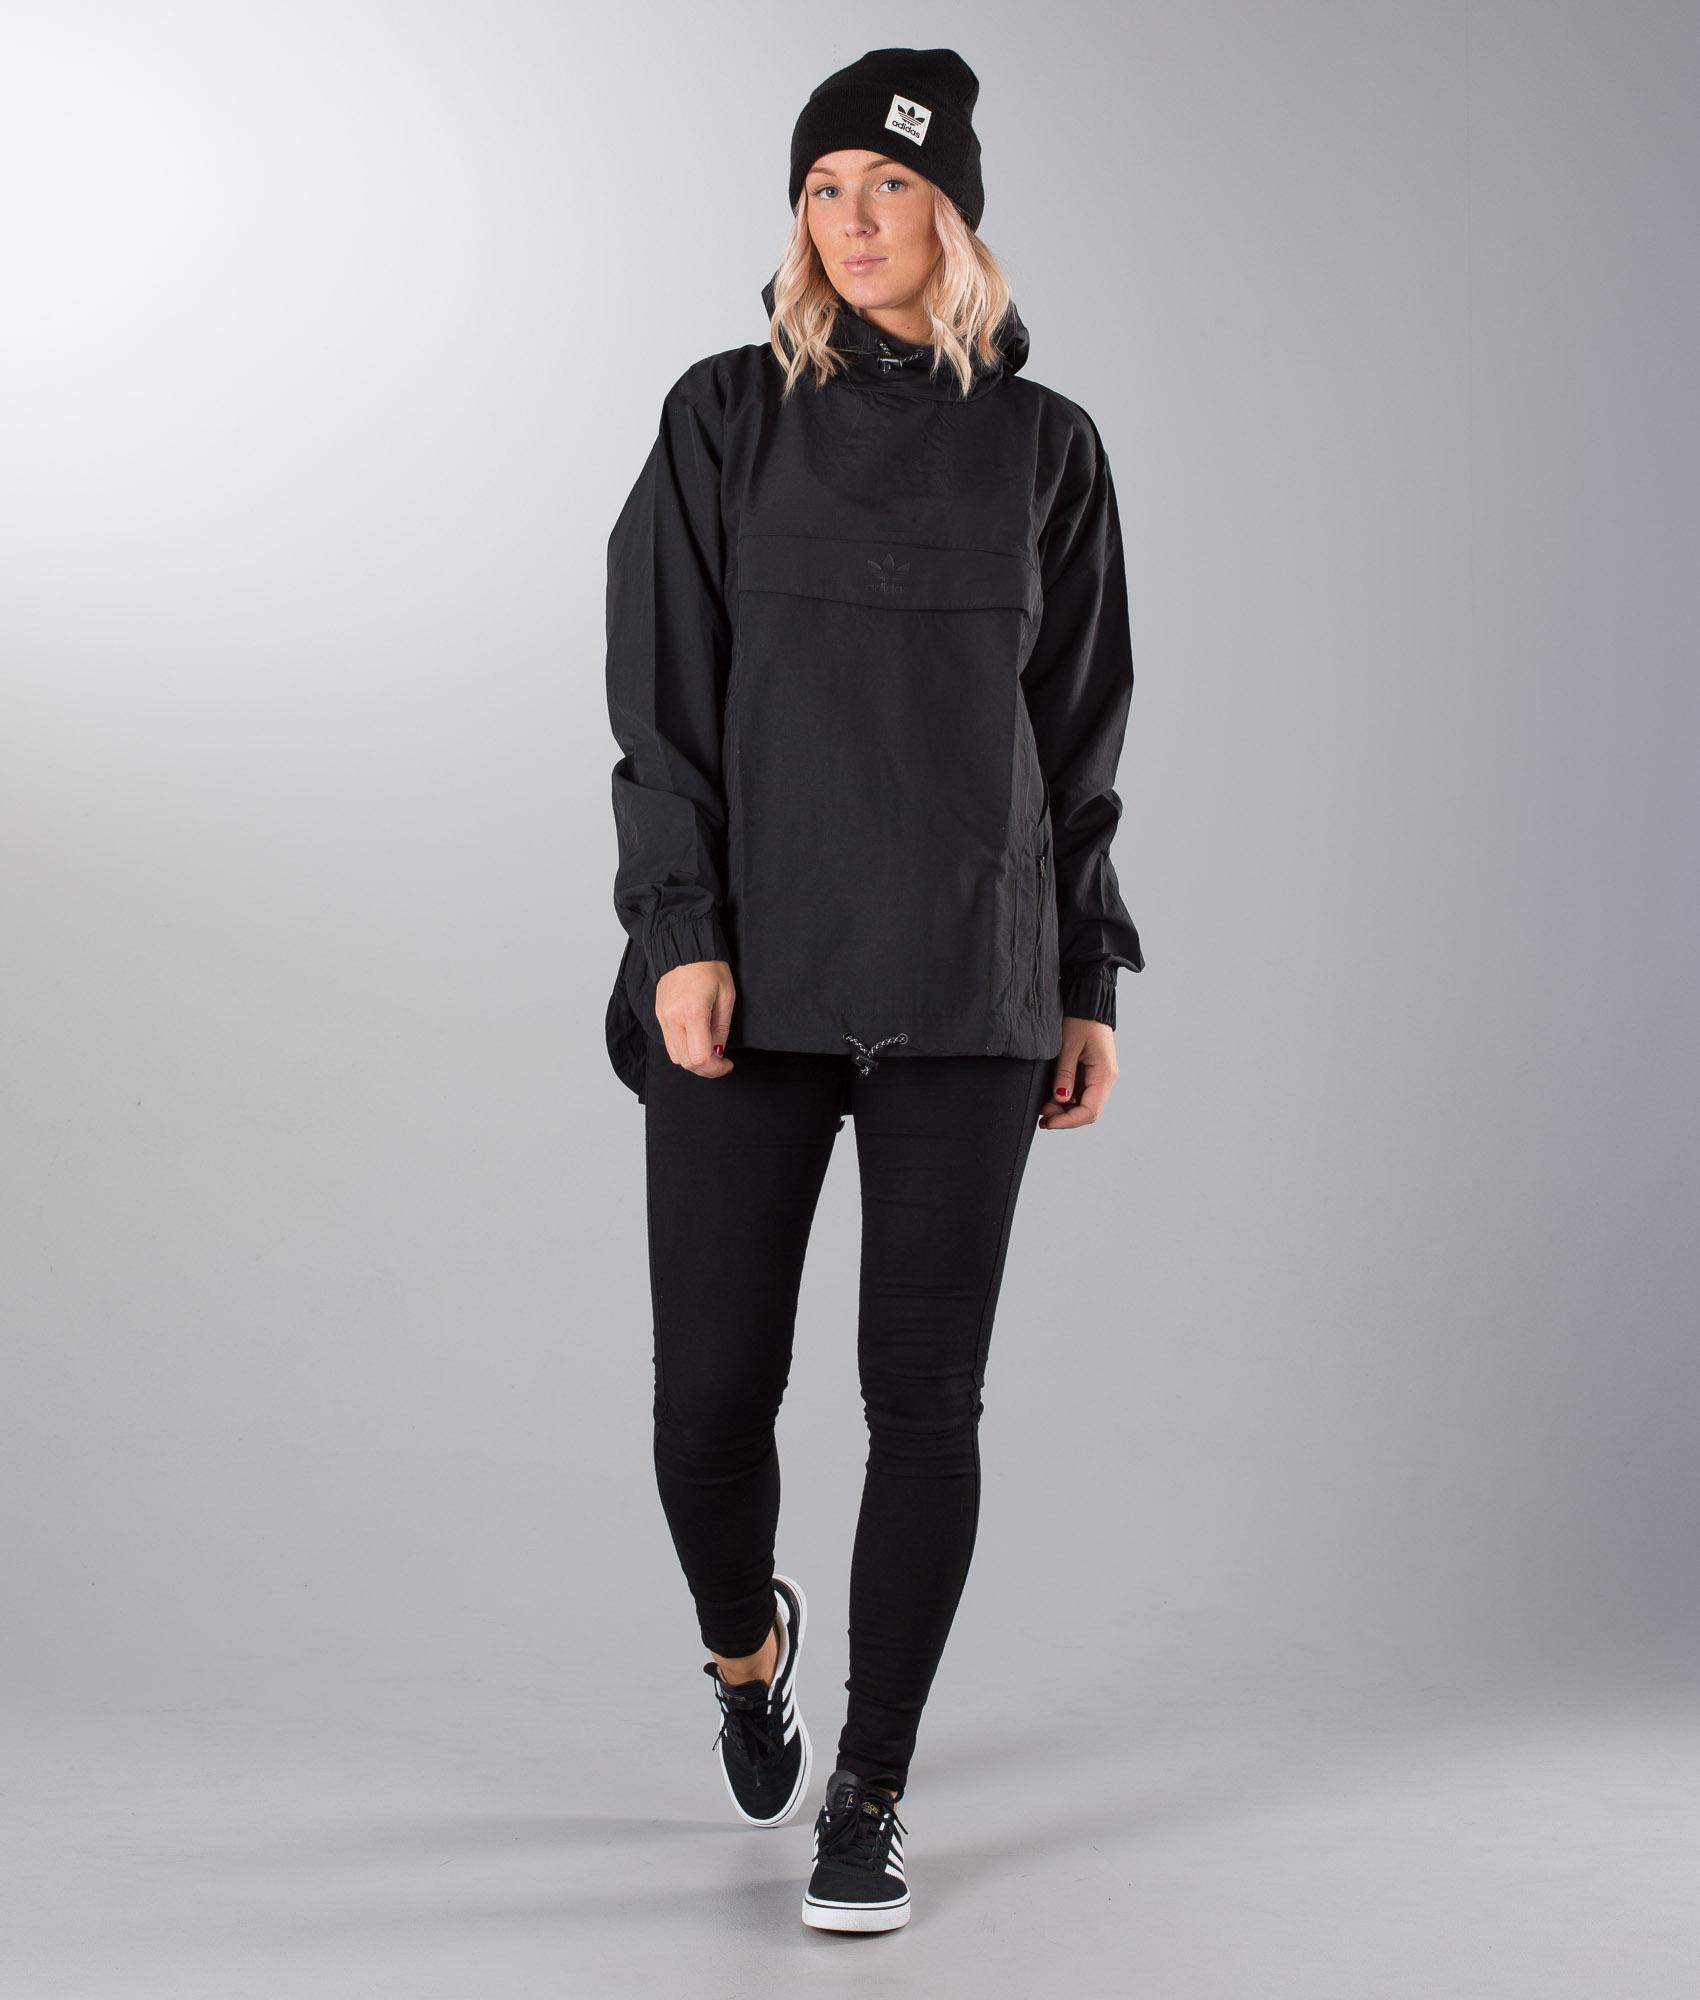 Adidas Originals Sst Tt Jacke Black Ridestore.ch